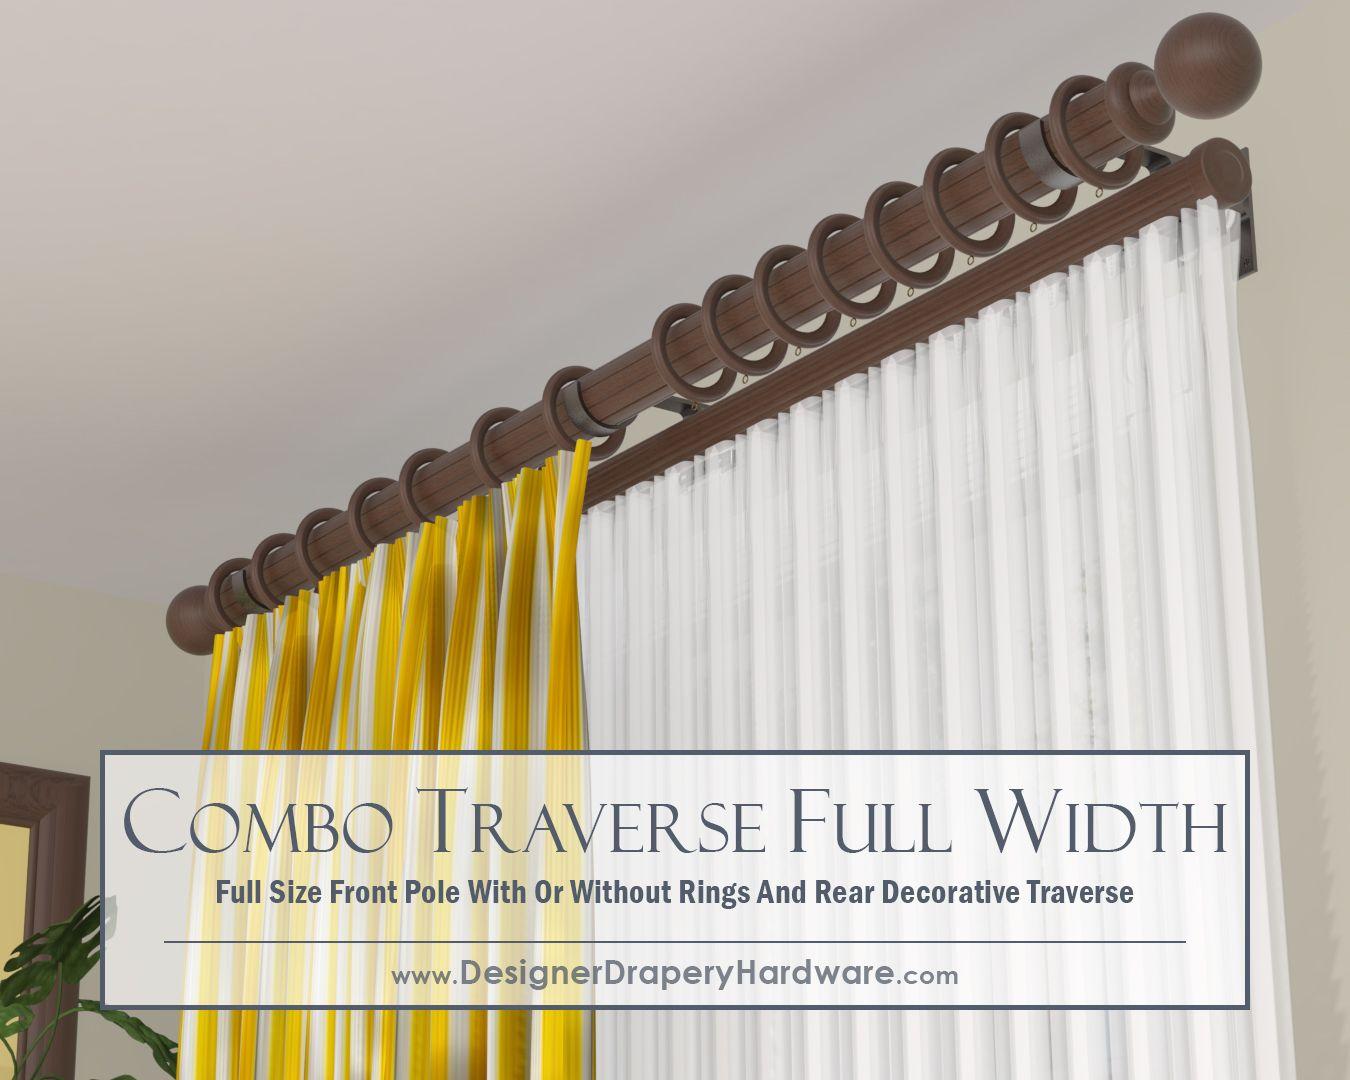 Http Www Designerdraperyhardware Com Combination Decorative